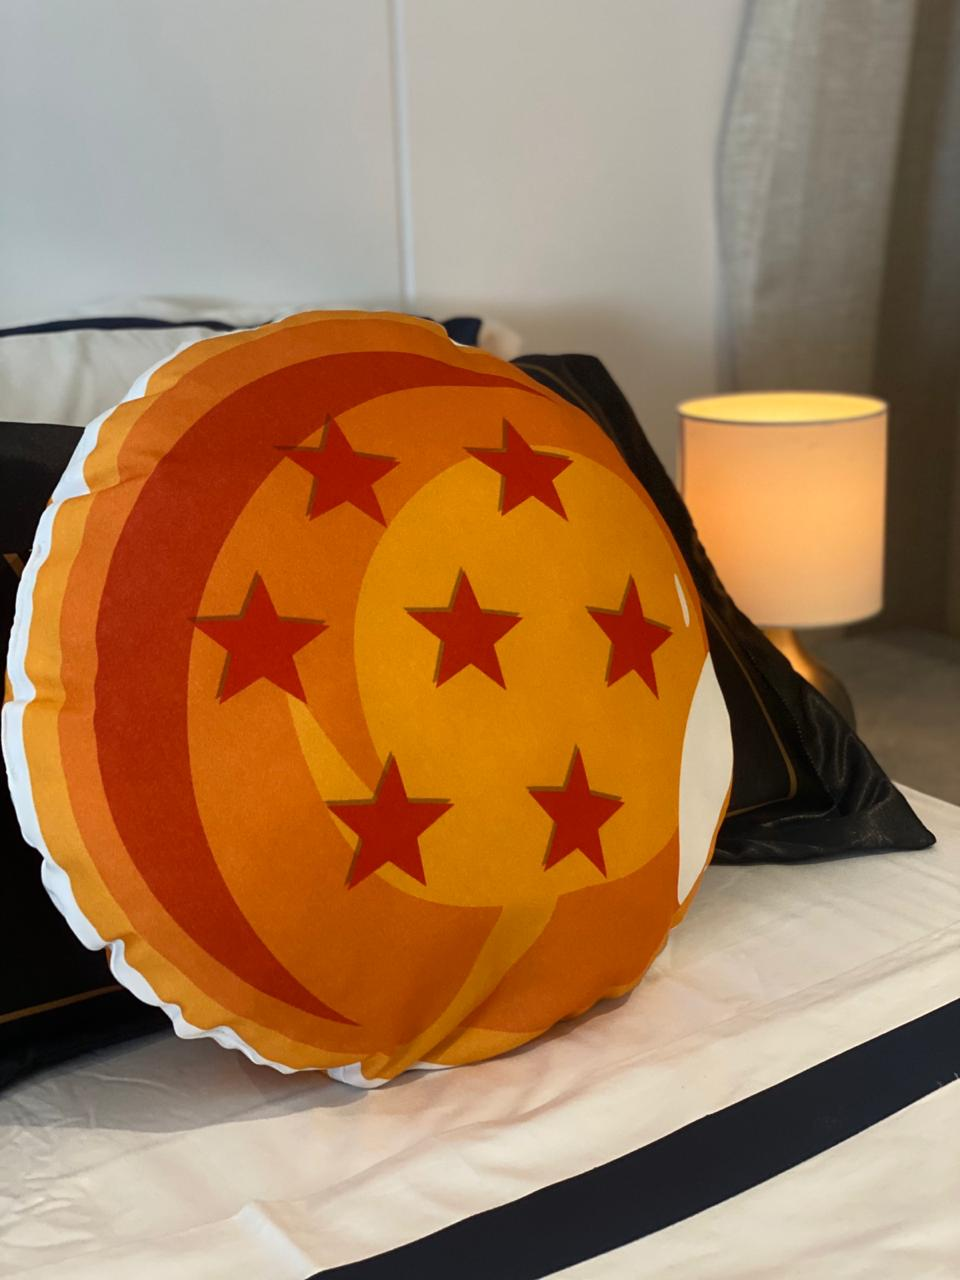 Almofada Geek: Esfera do Dragão ( 7 Estrelas ) - Dragon Ball